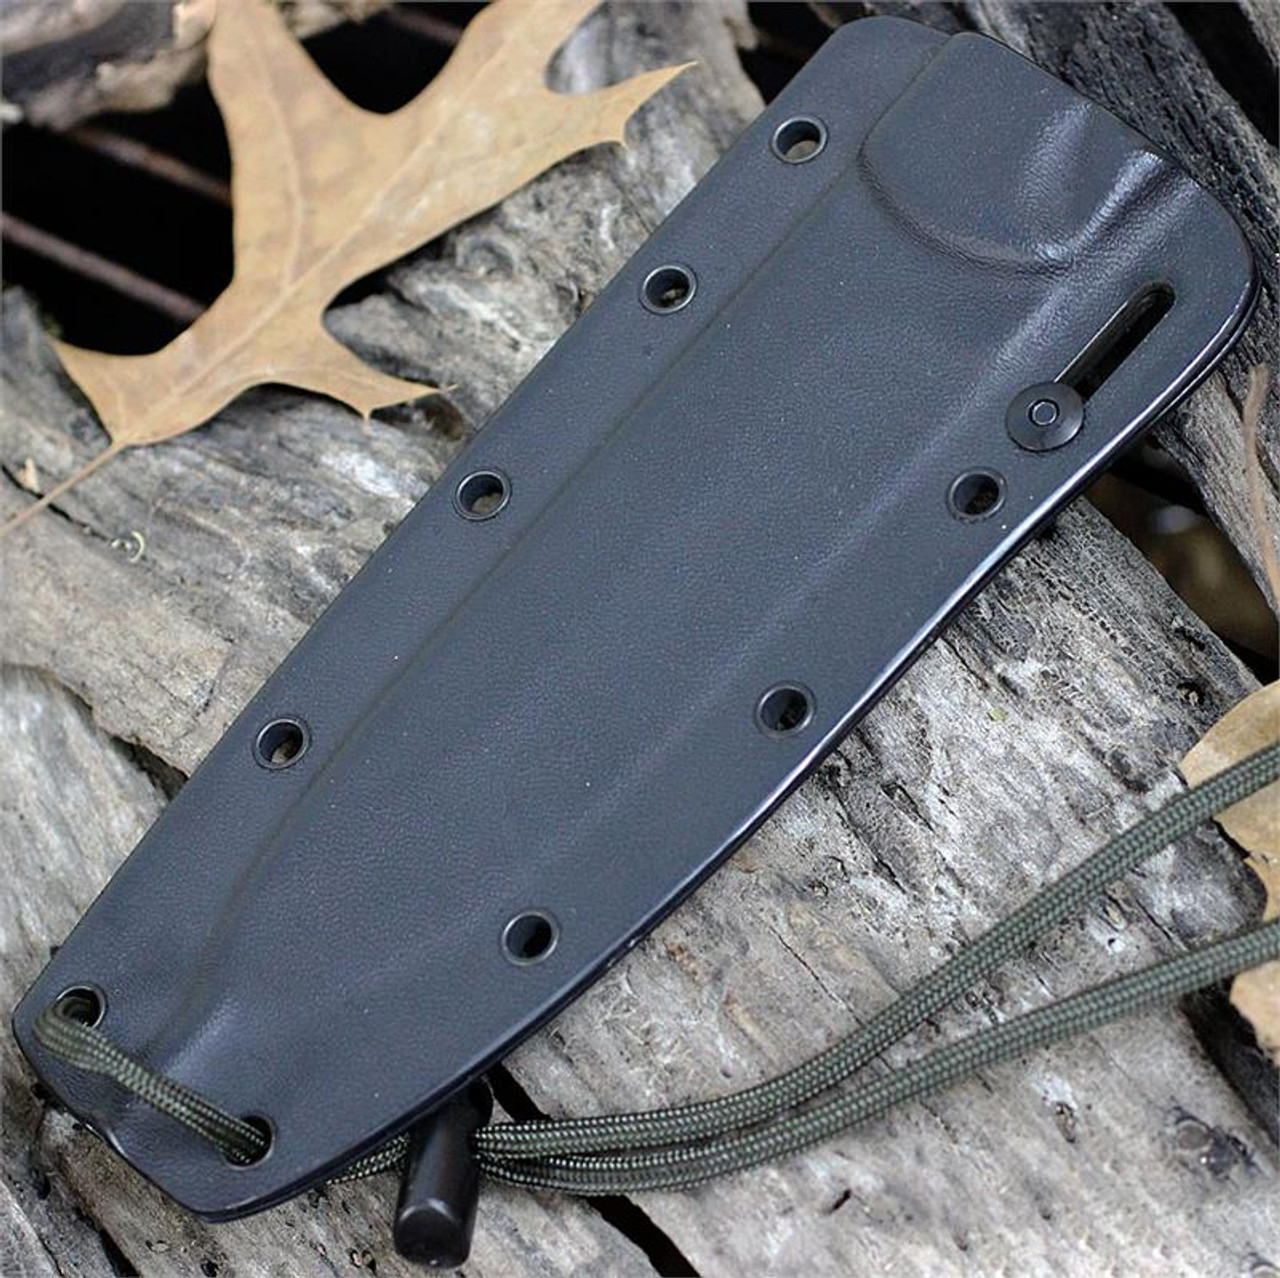 ESEE Knives Hoffman, CM-6-TG-B, Tactical Gray Plain Edge Blade, Black G-10 Handle, Black Kydex Sheath and Clip Plate